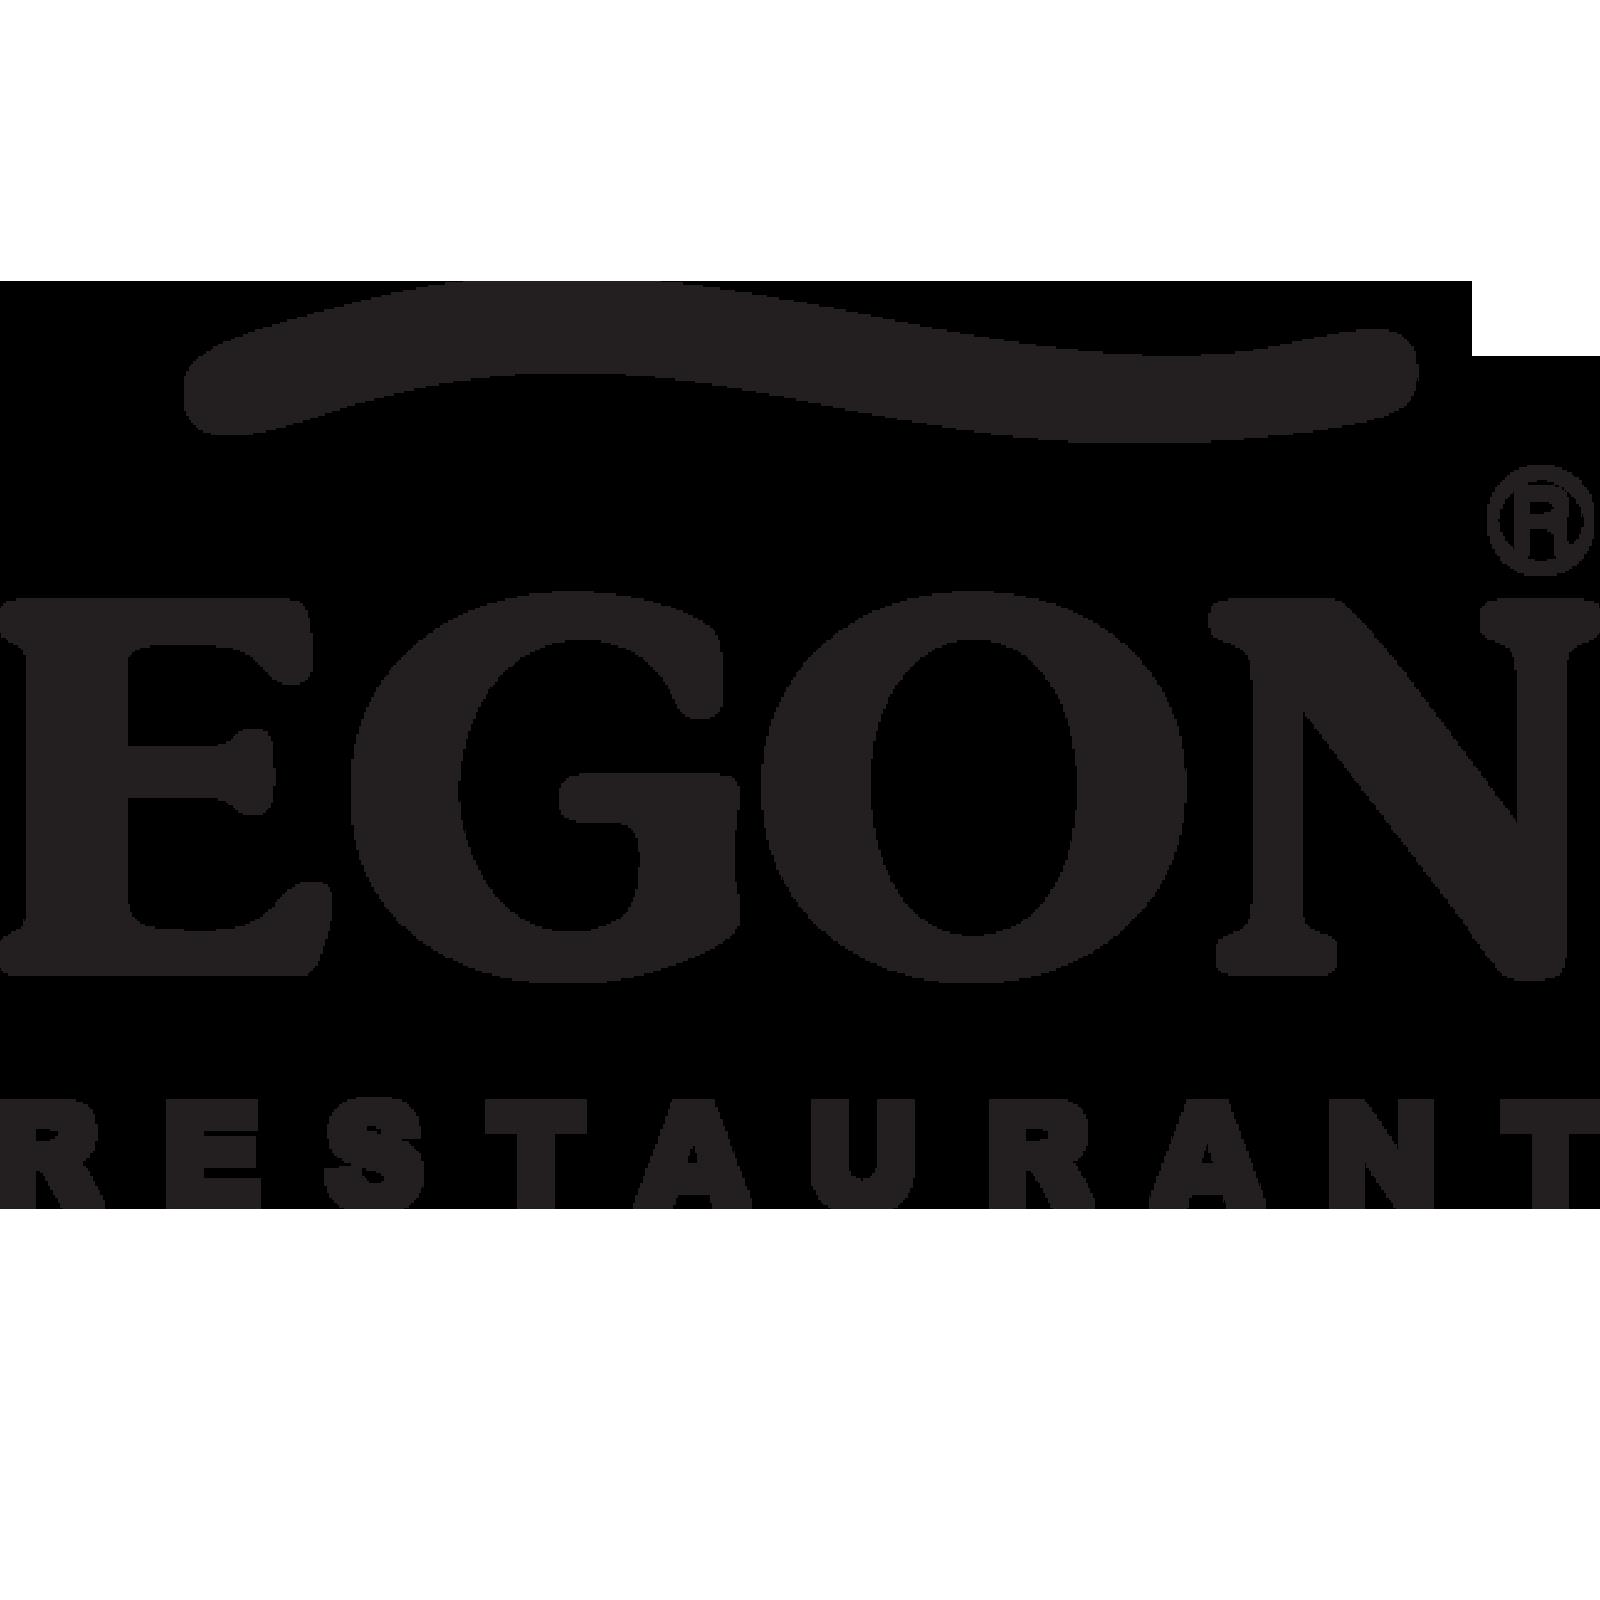 EGON LOGO-2